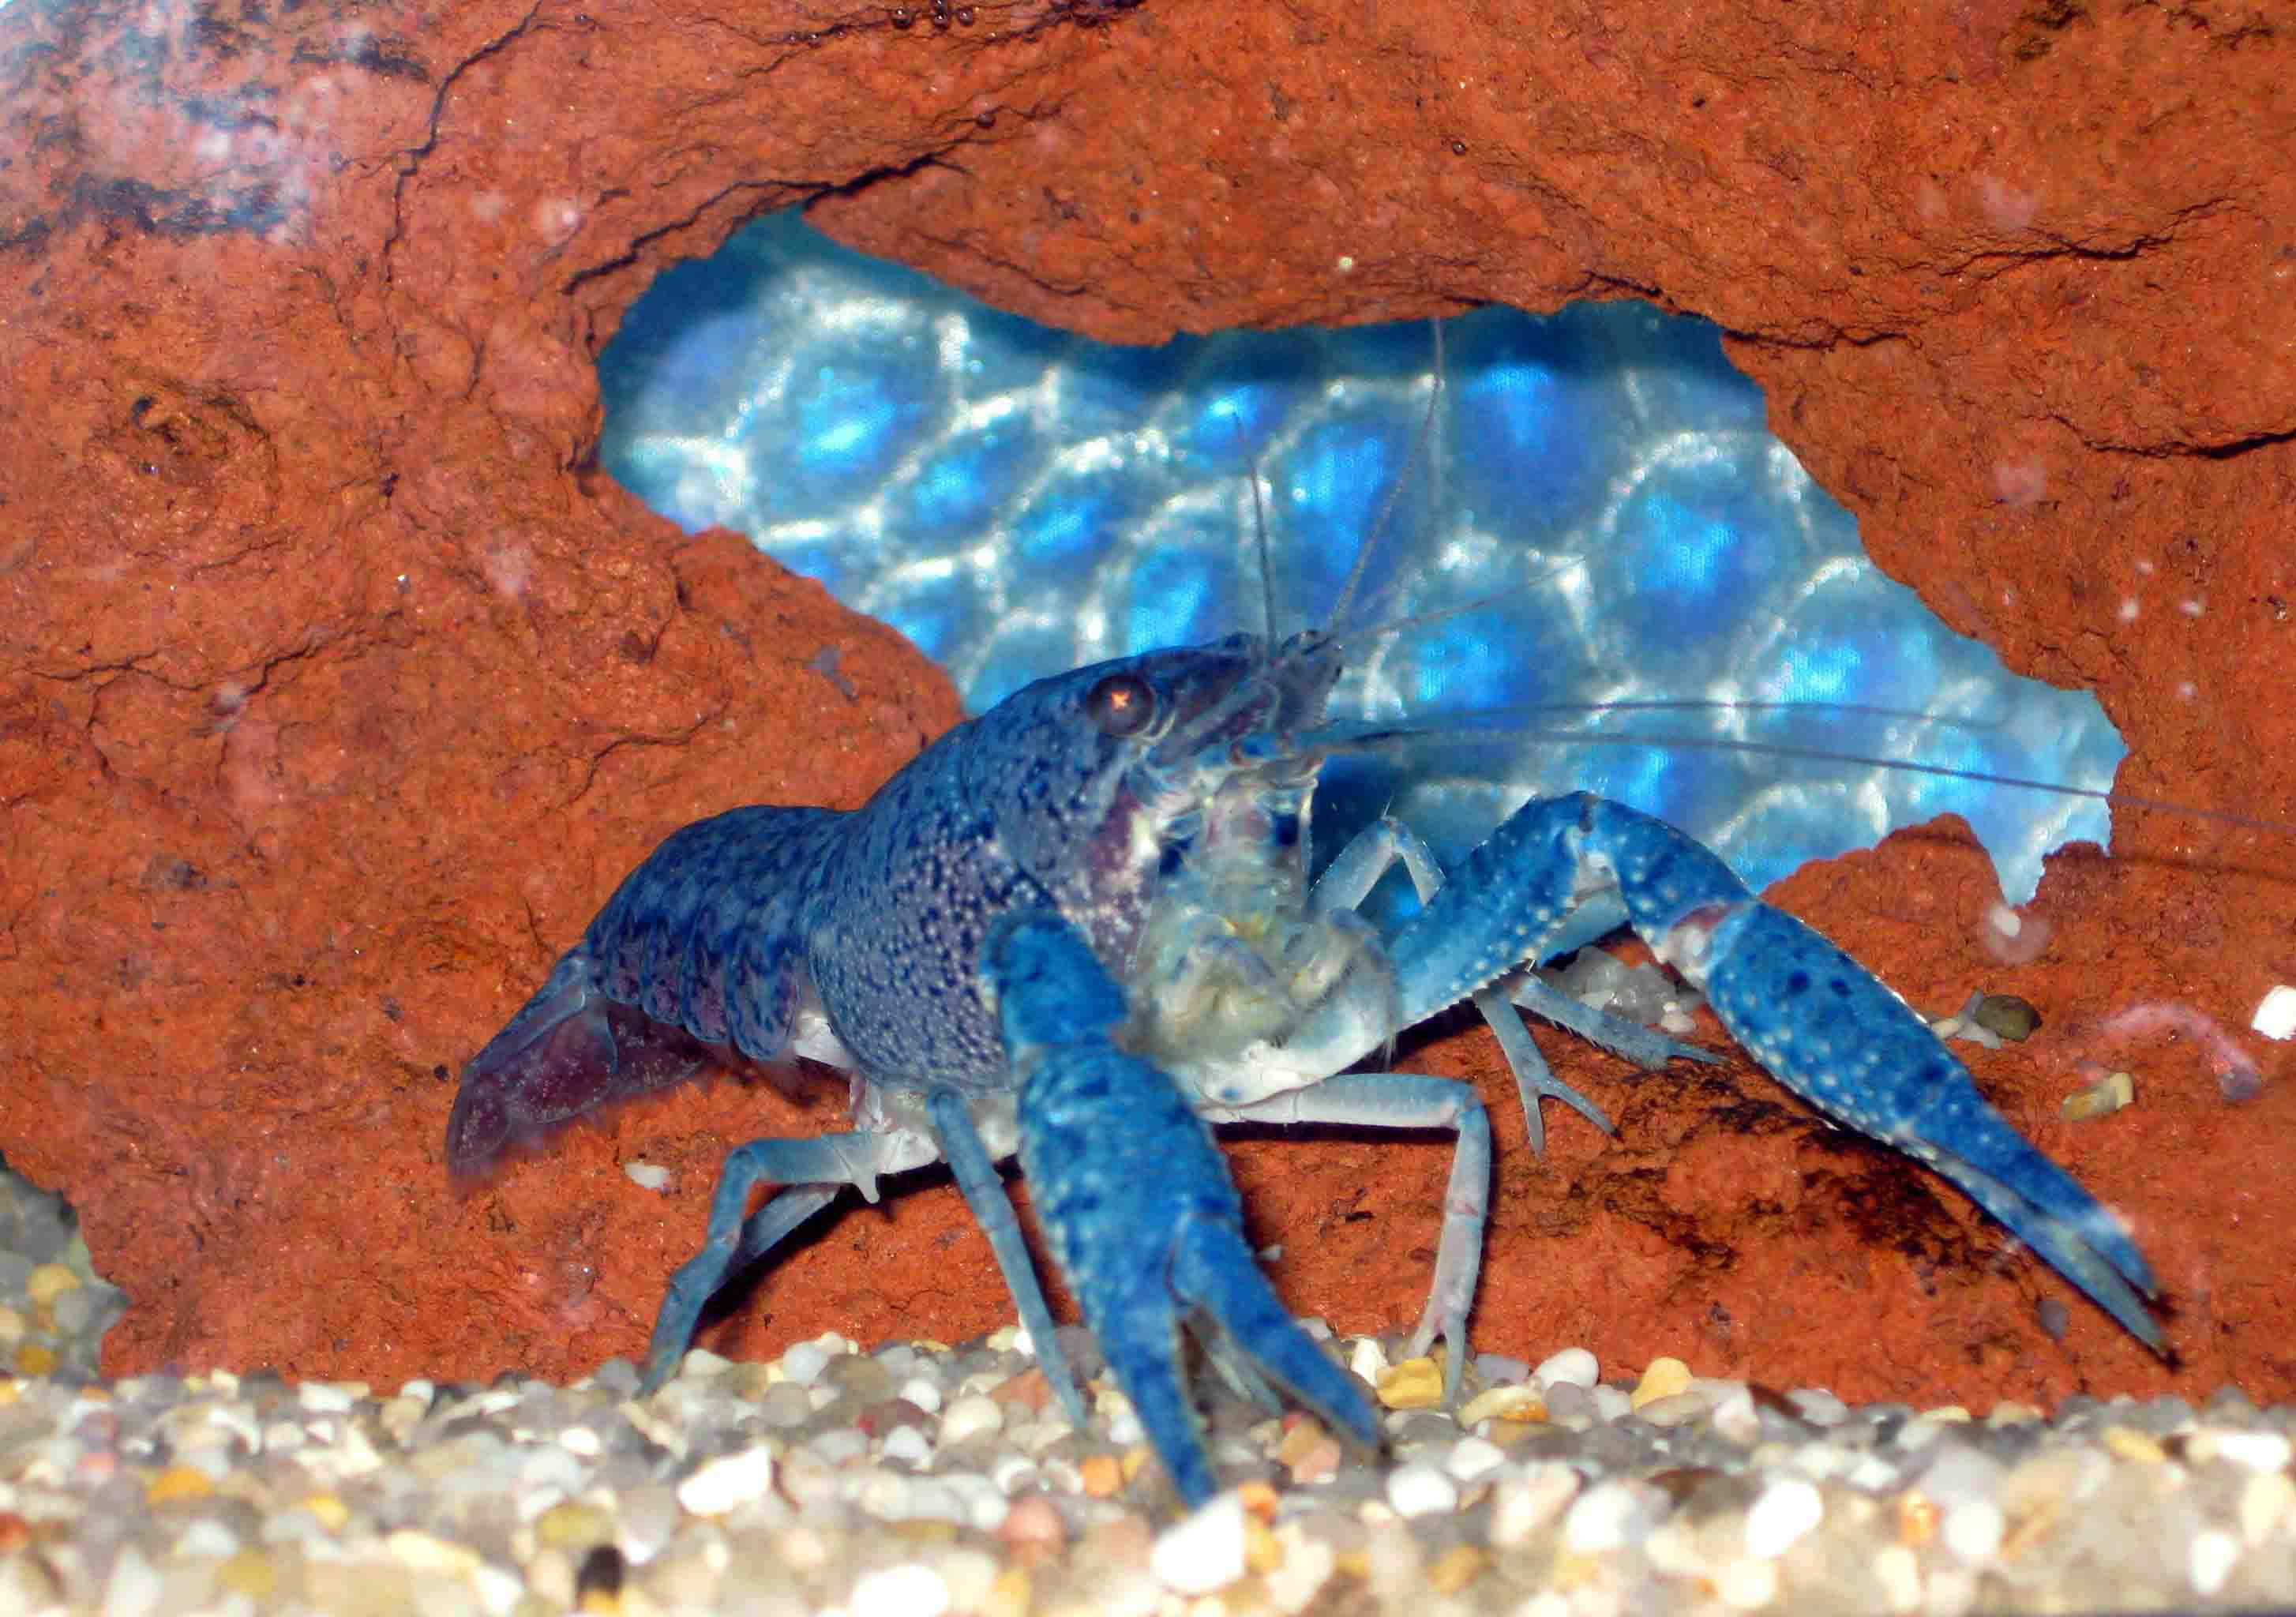 Blue Crayfish Eggs | www.pixshark.com - Images Galleries ...